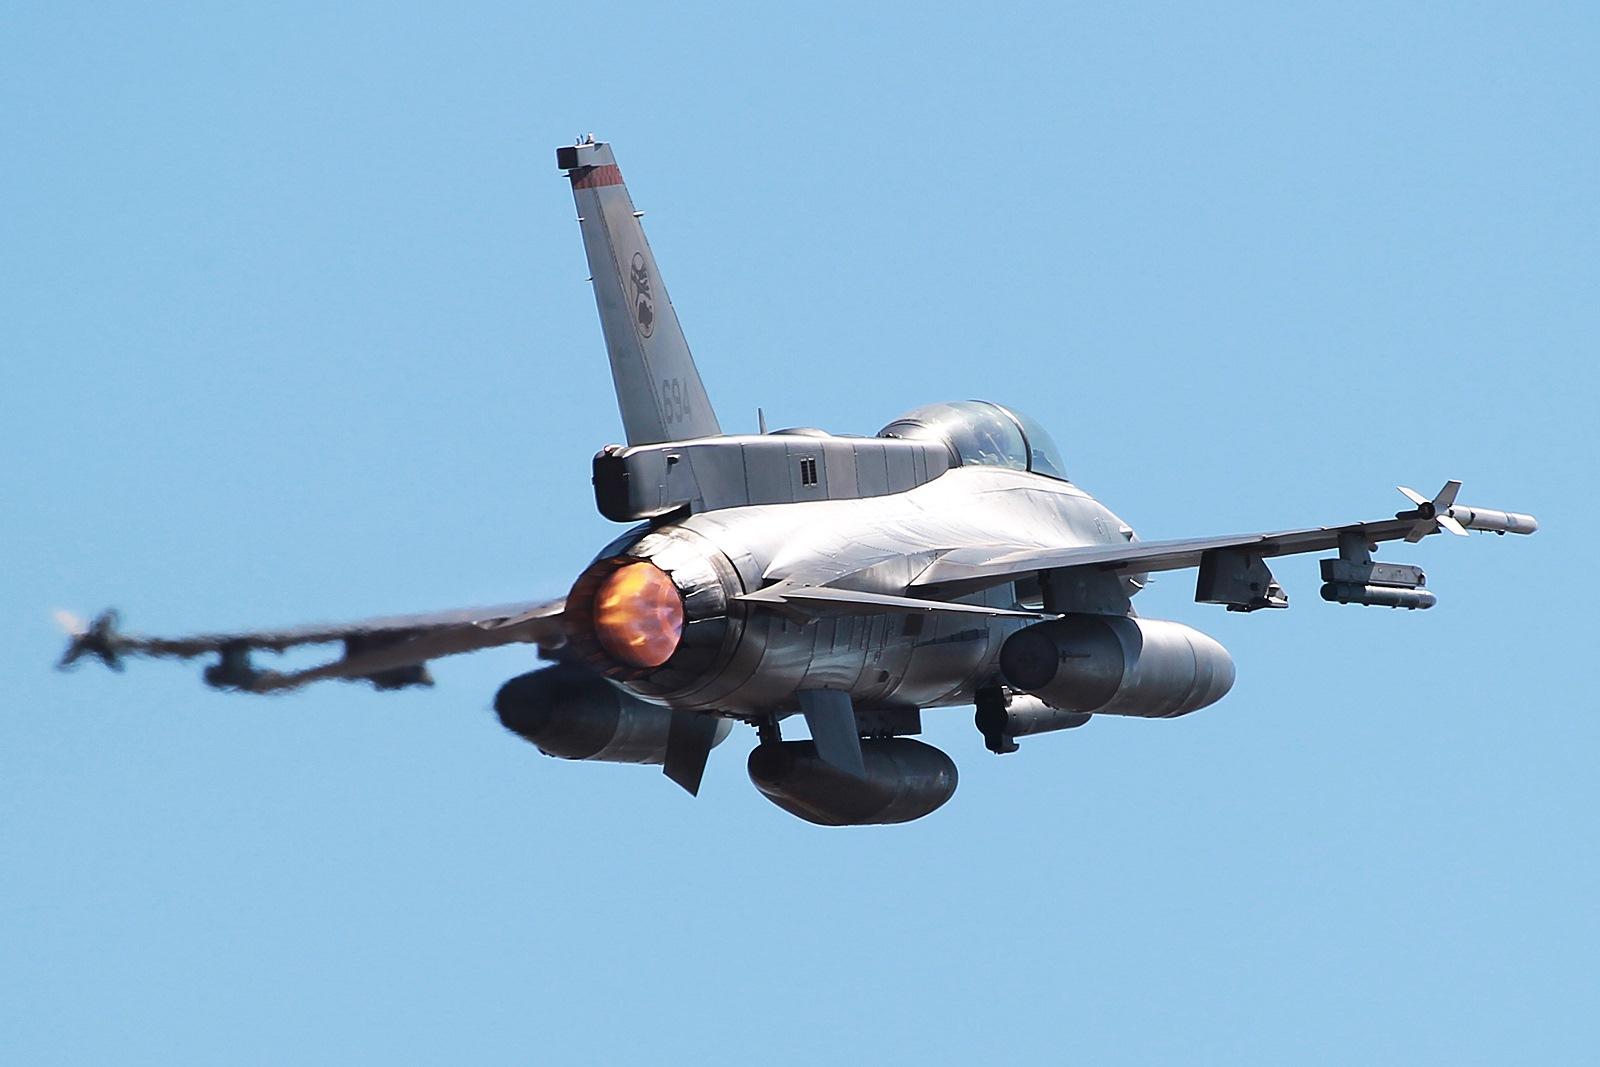 Pitch Black 14 훈련중 출격하는 싱가폴공군 F-16 B..